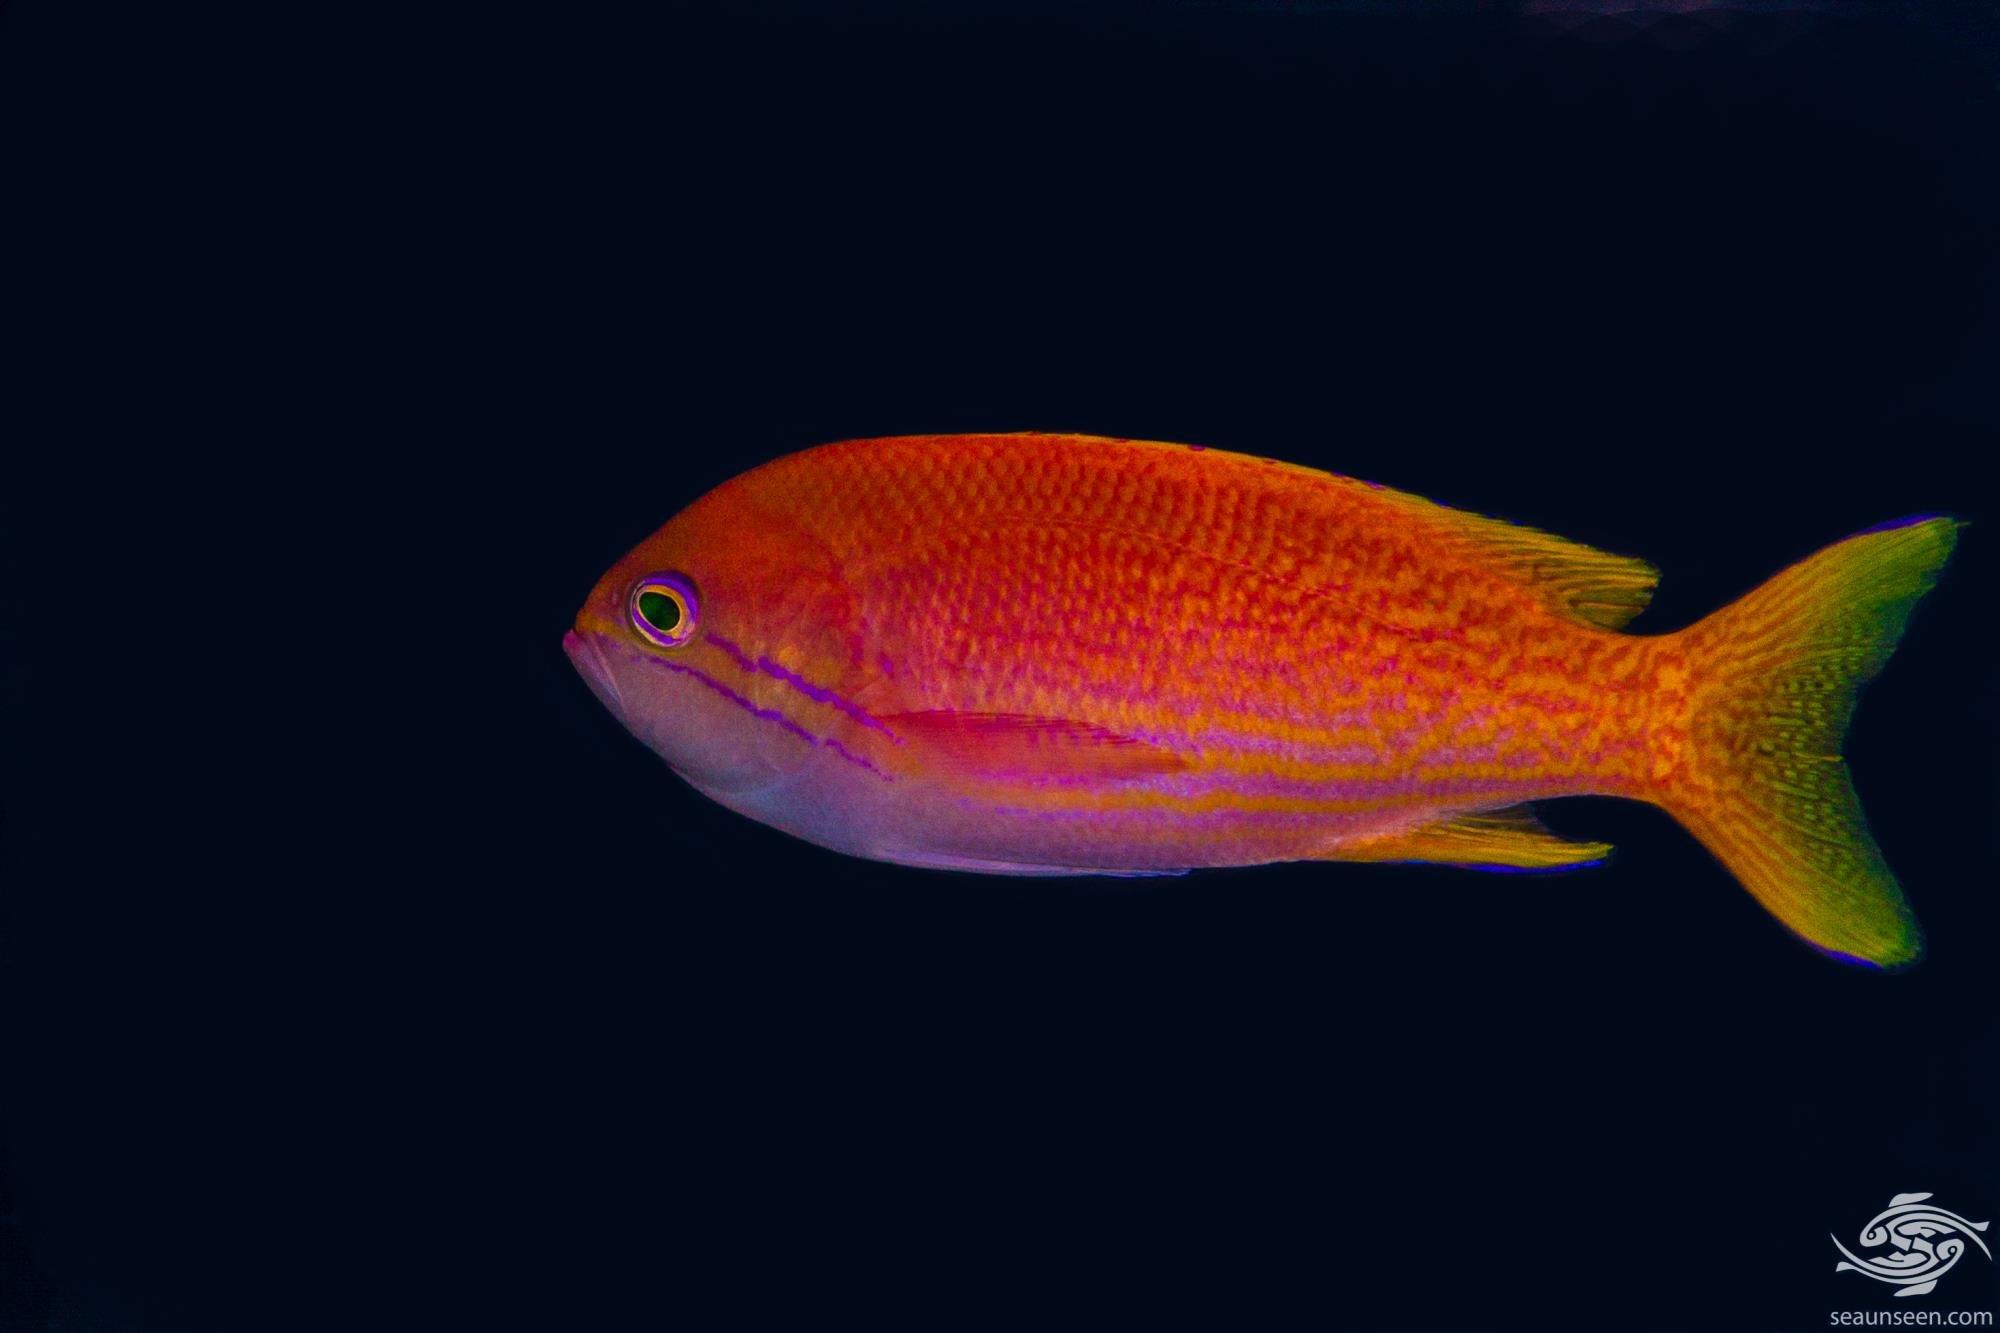 Twospot Anthias (Pseudanthias bimaculatus) is also known as the twinspot anthias and two-spot basslet